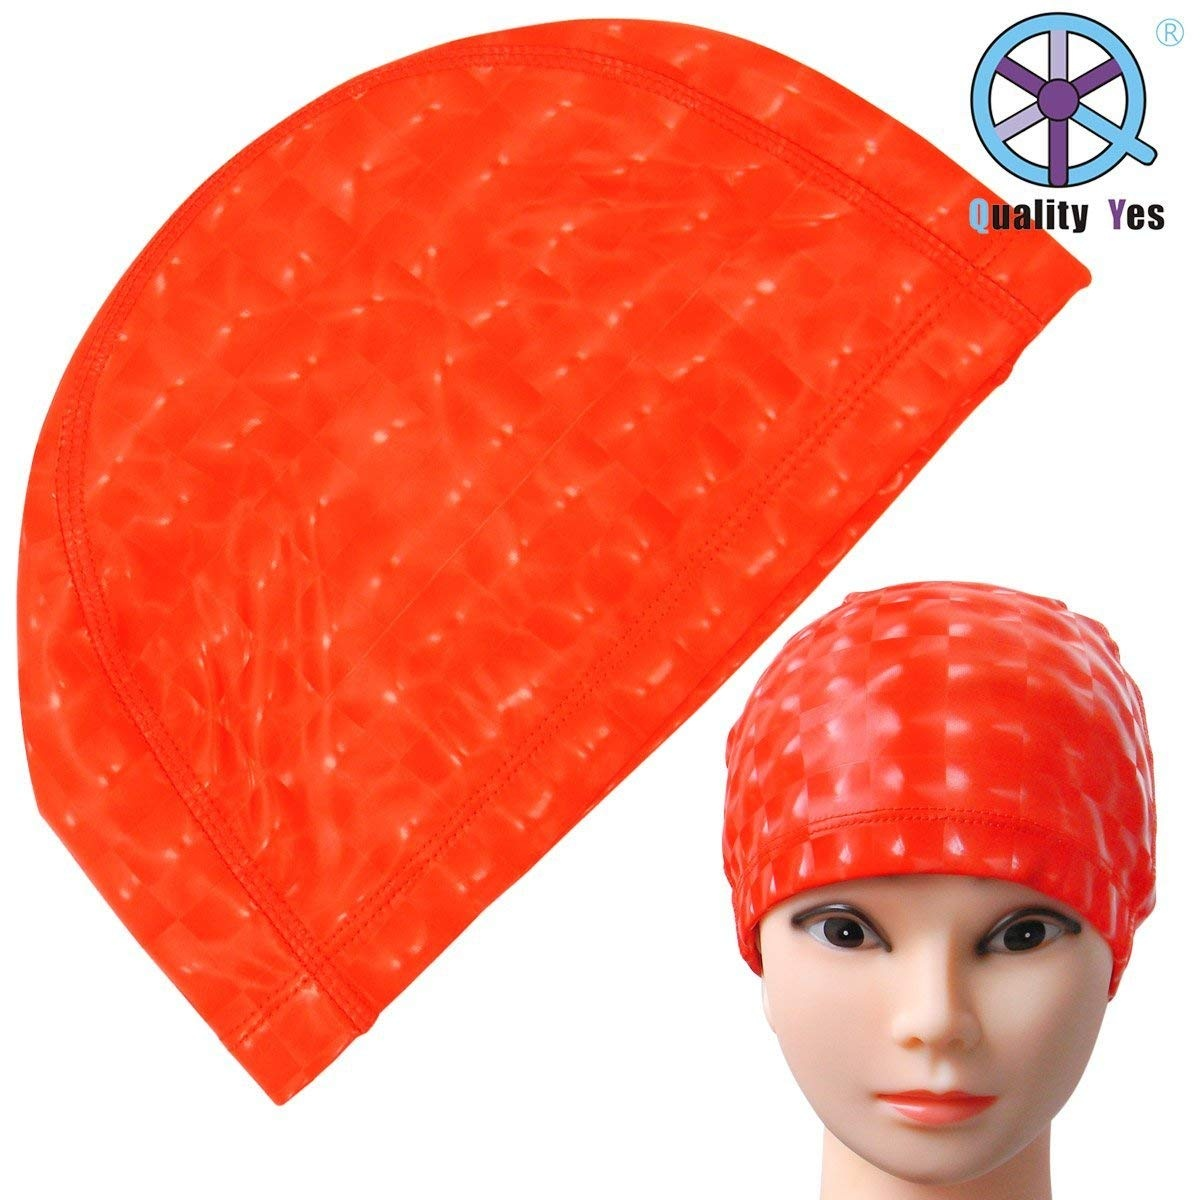 4bda918f13a Quality Yes Red Extra Large Waterproof Soft Cloth Swim Cap Ear ...